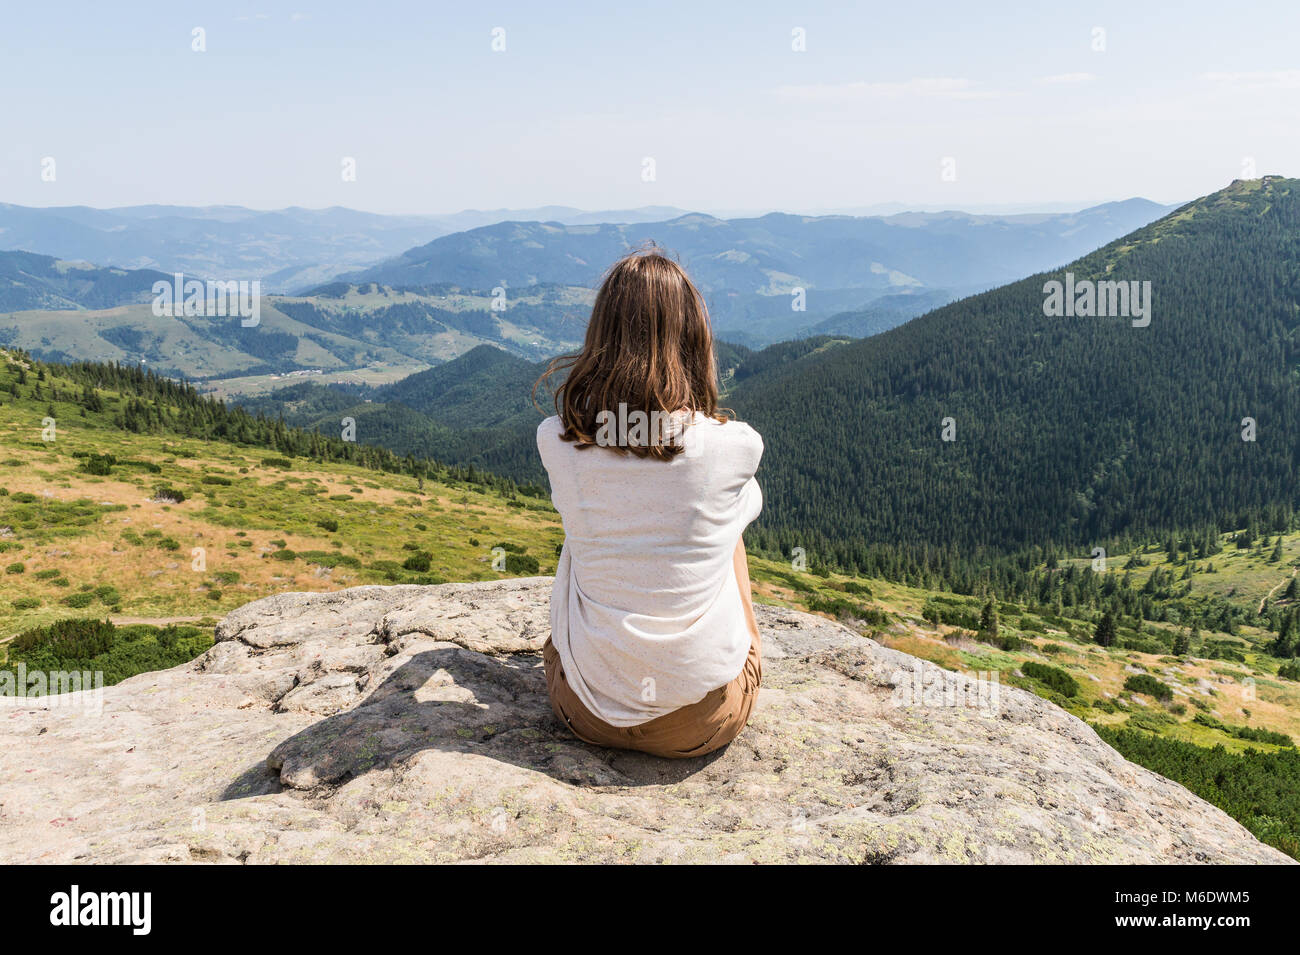 girl tourist enjoys gorgeous landscape scenery on hot sunny day - Stock Image